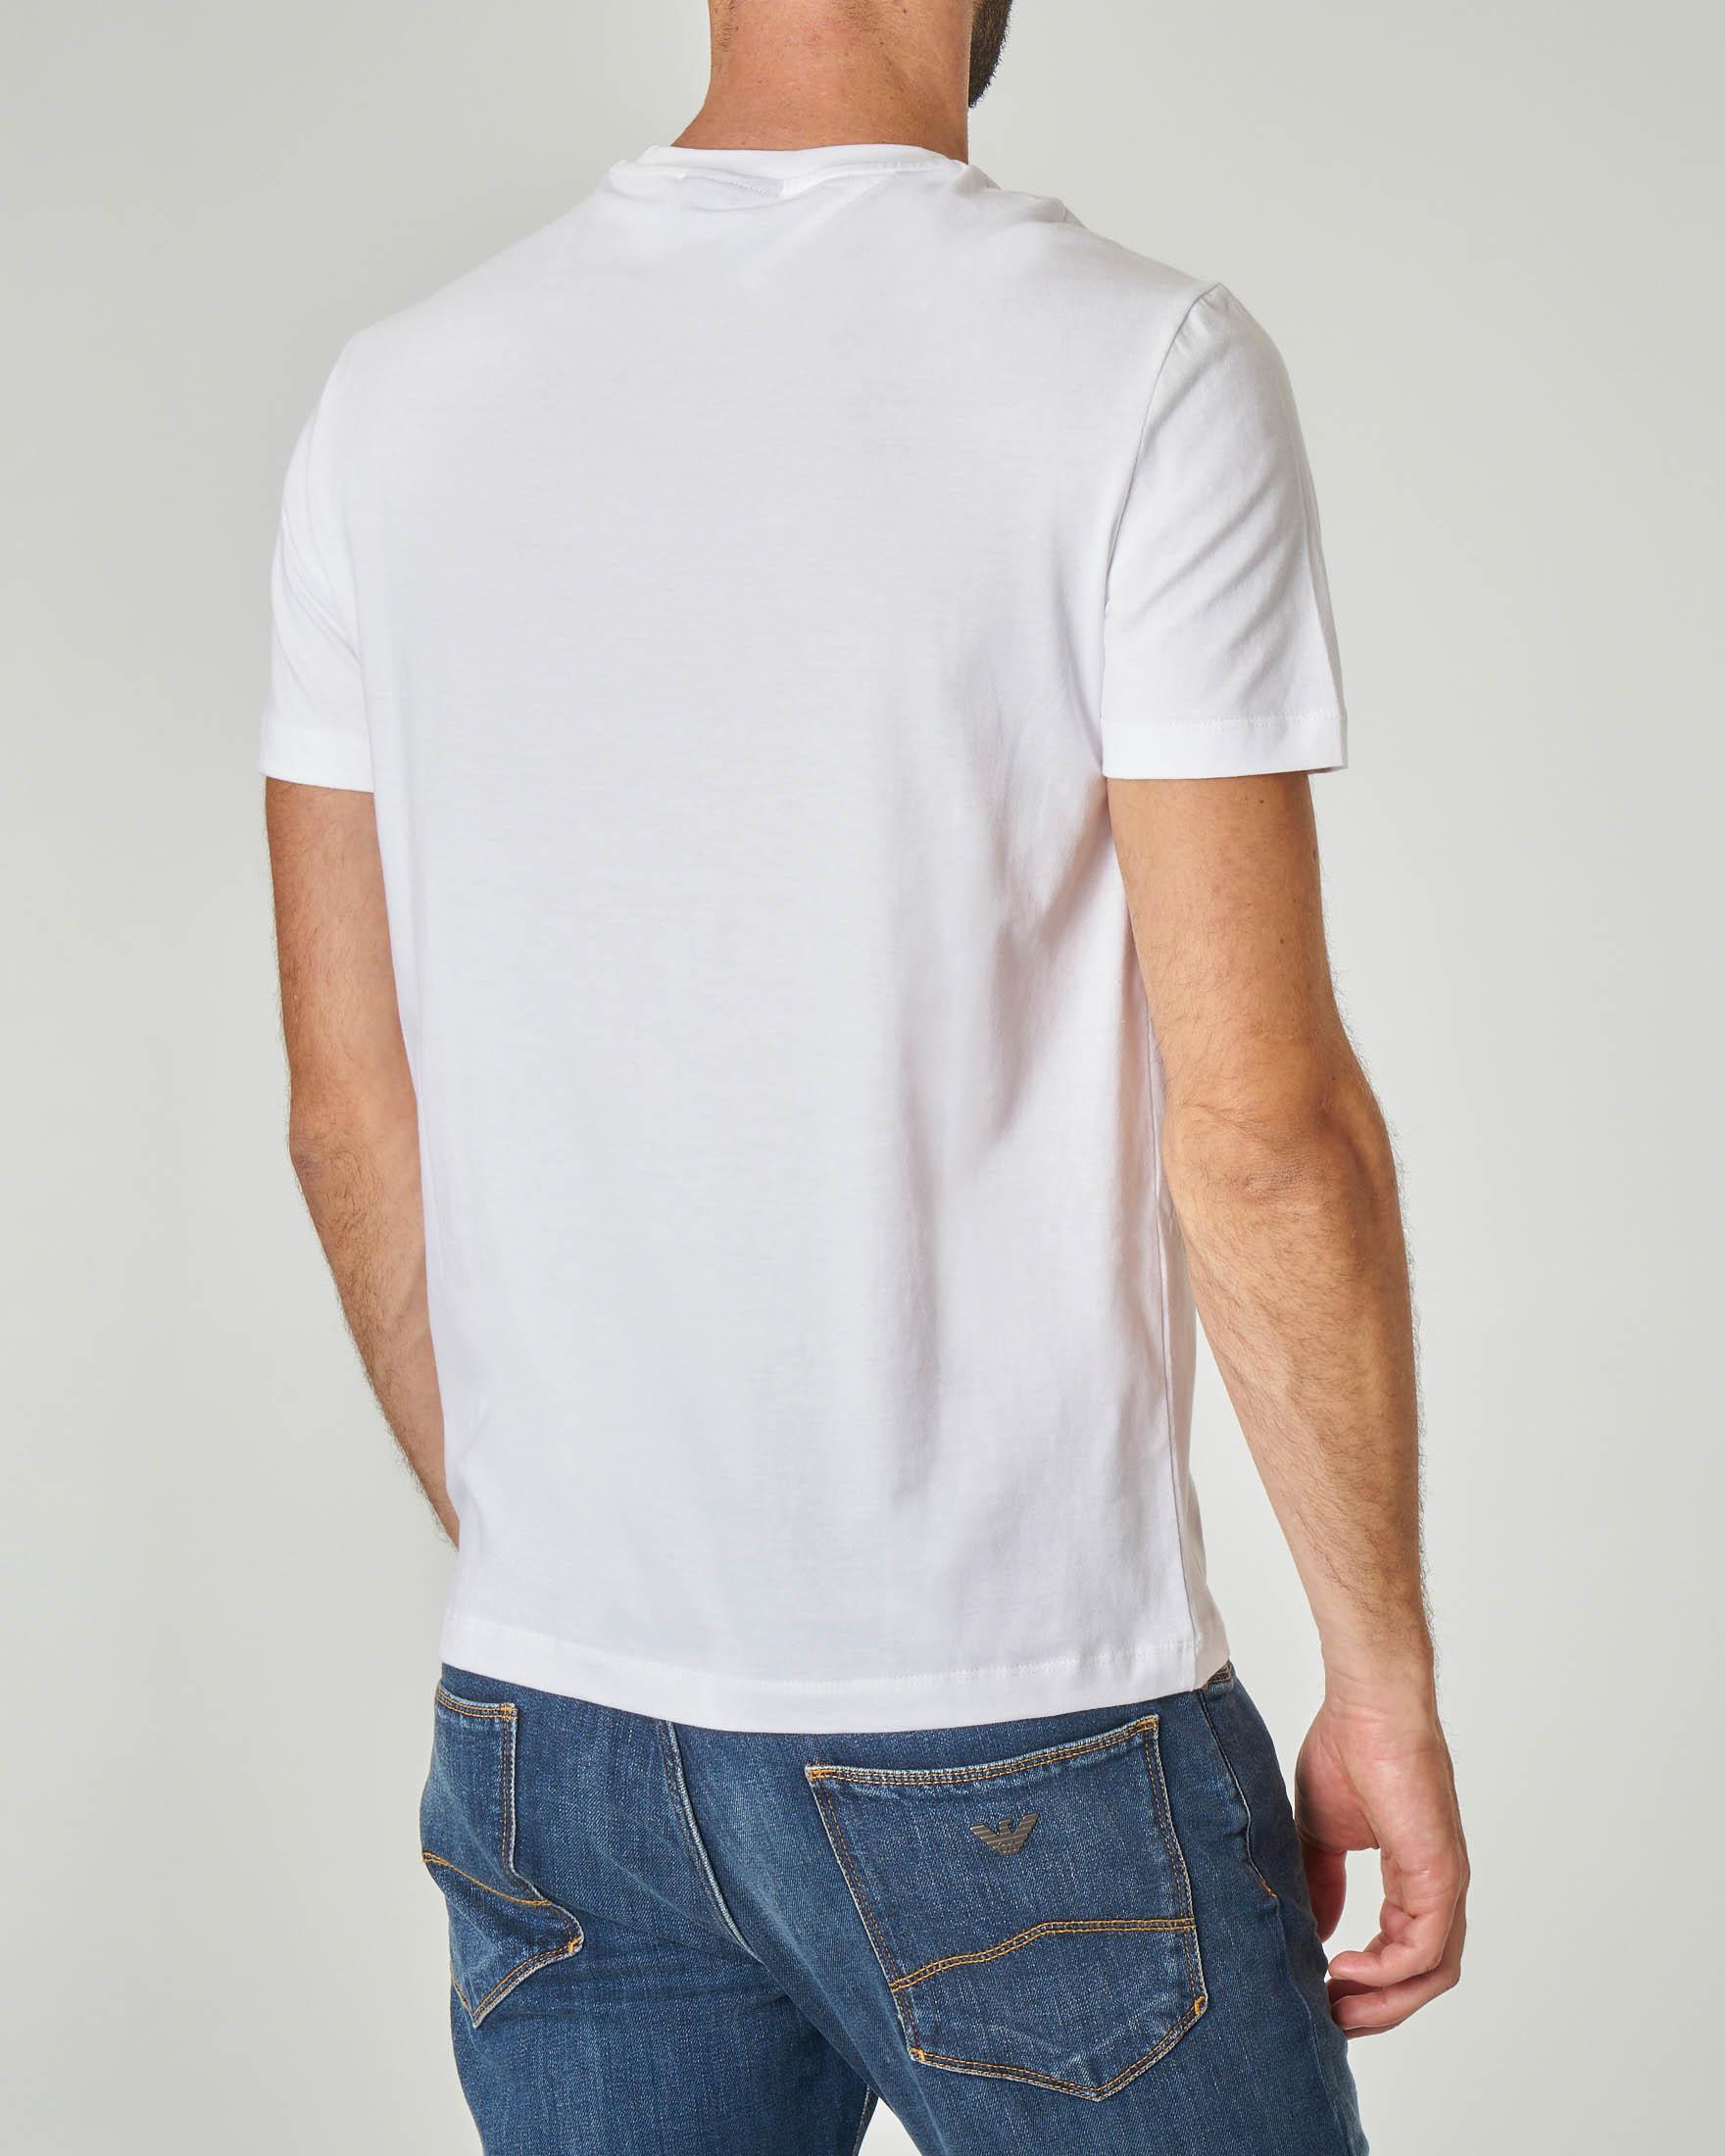 T-shirt bianca con logo aquila ricamato